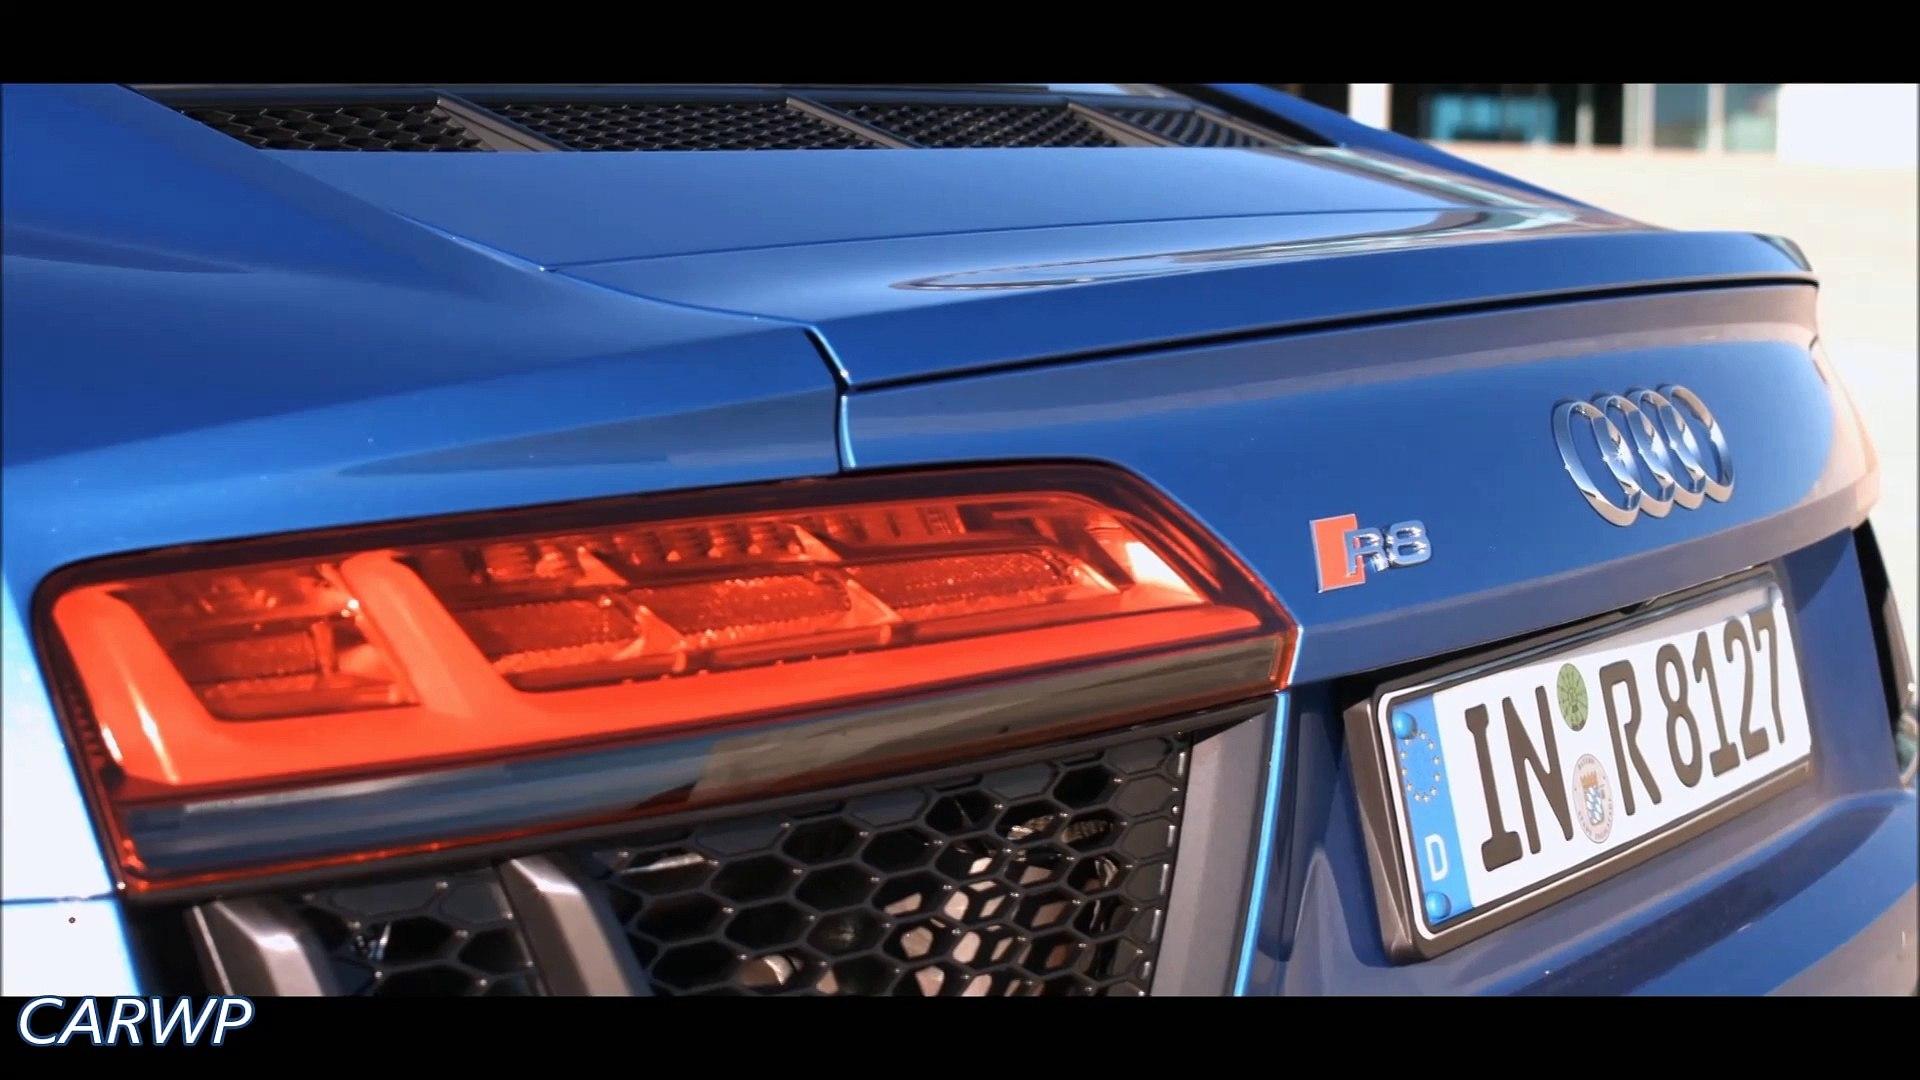 DESIGN €187.400 Novo Audi R8 V10 Plus 2016 4x4 aro 20 5.2 610 cv 57,1 mkgf 330 kmh 0-100 kmh 3,2 s @